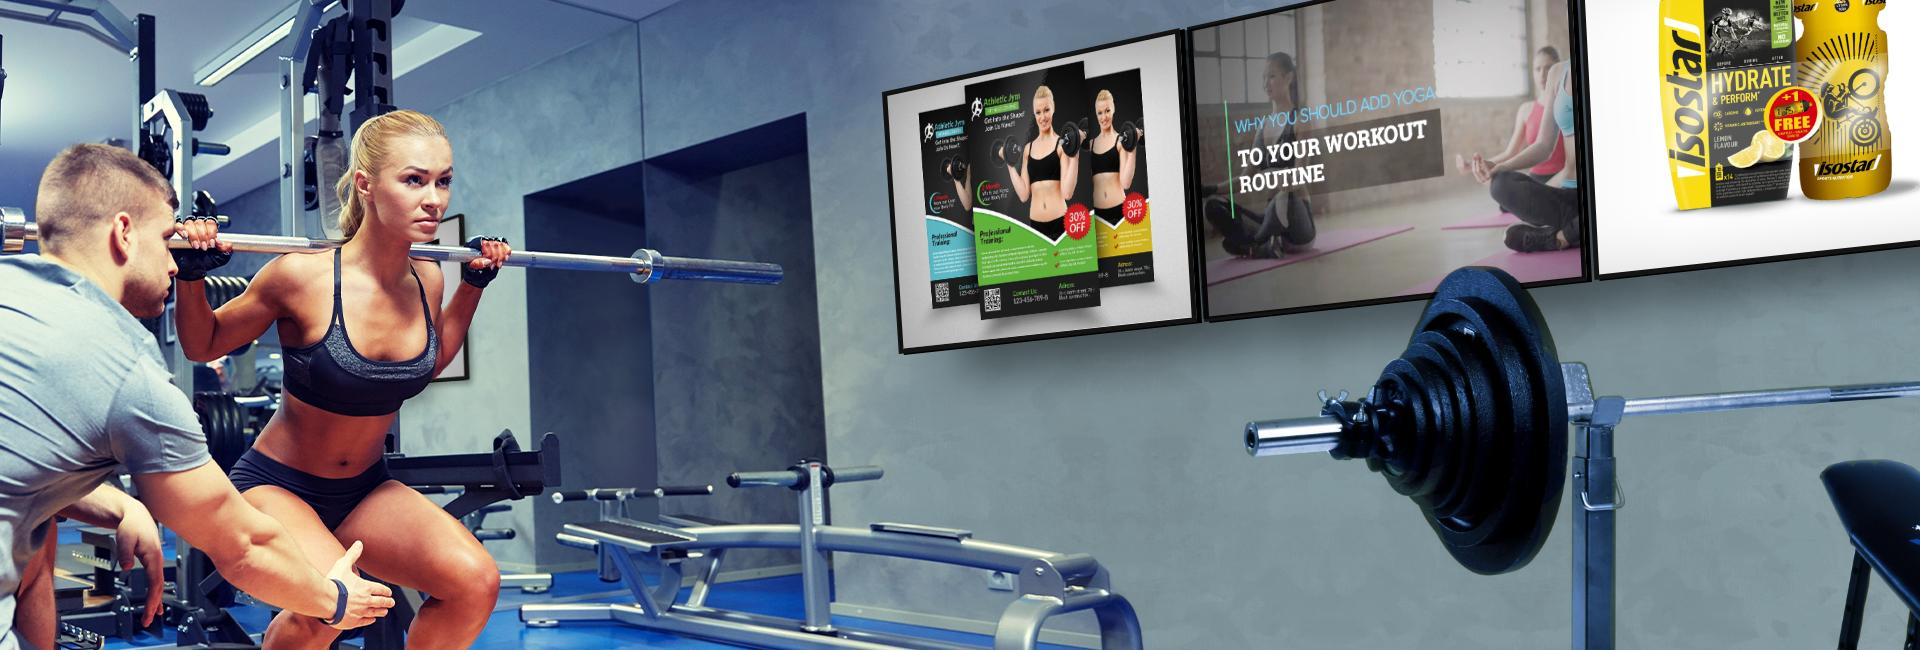 Narrowcasting in fitness ruimte